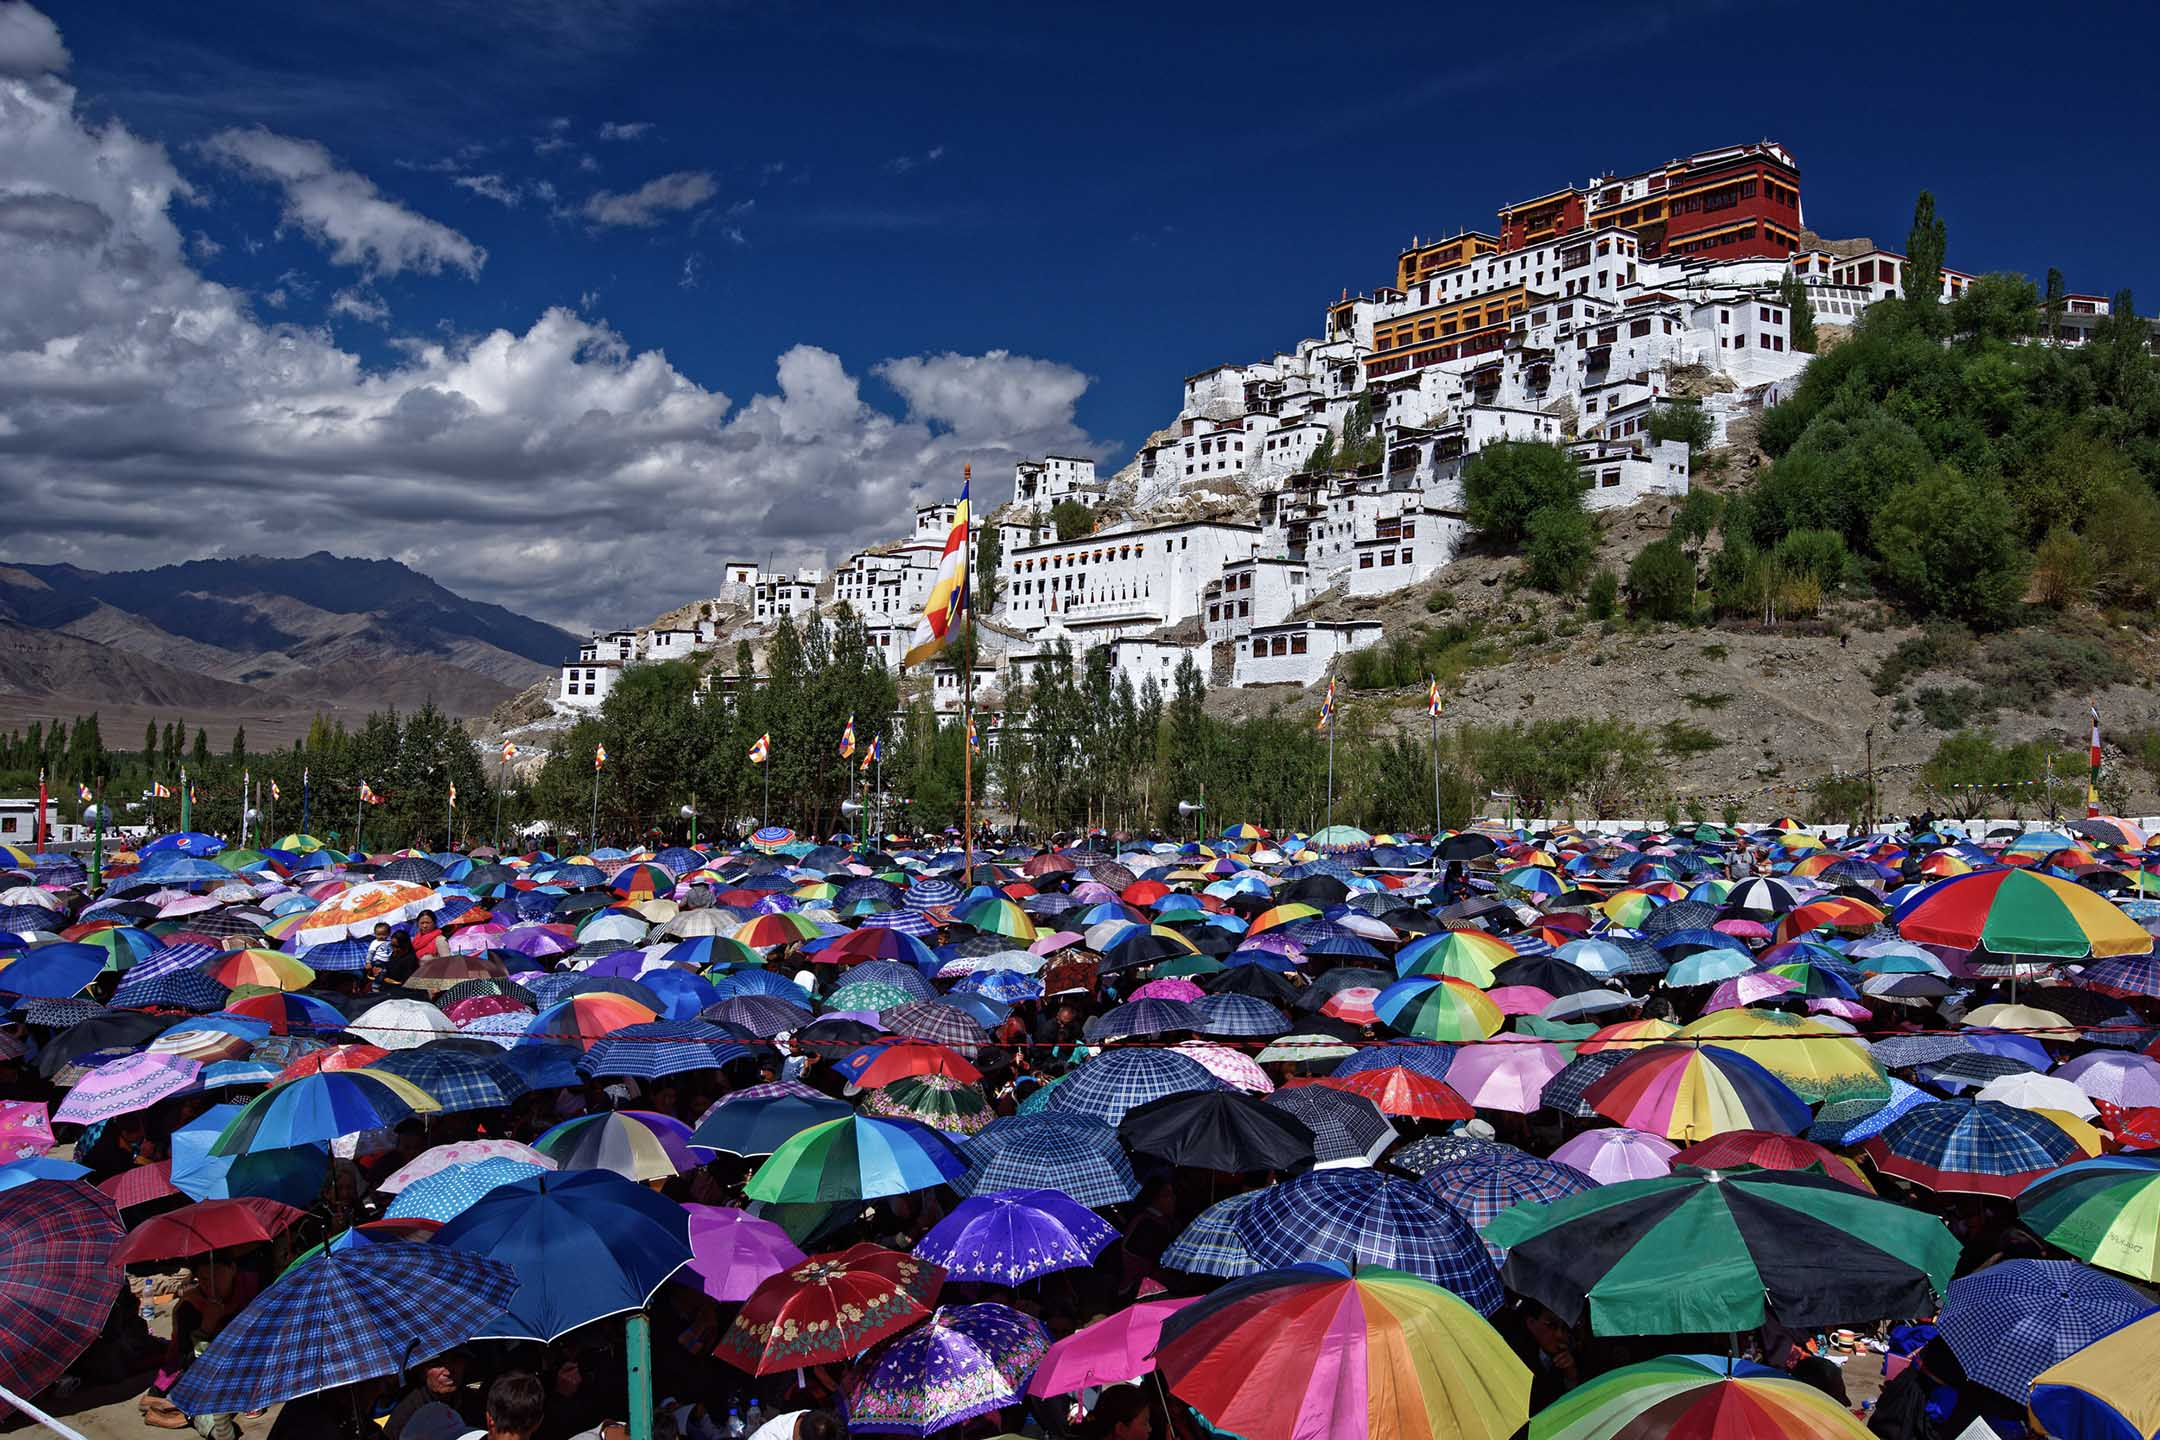 印度拉達克,人民在烈日下舉起雨傘。 攝:Maria Mantero/Barcroft Media via Getty Images